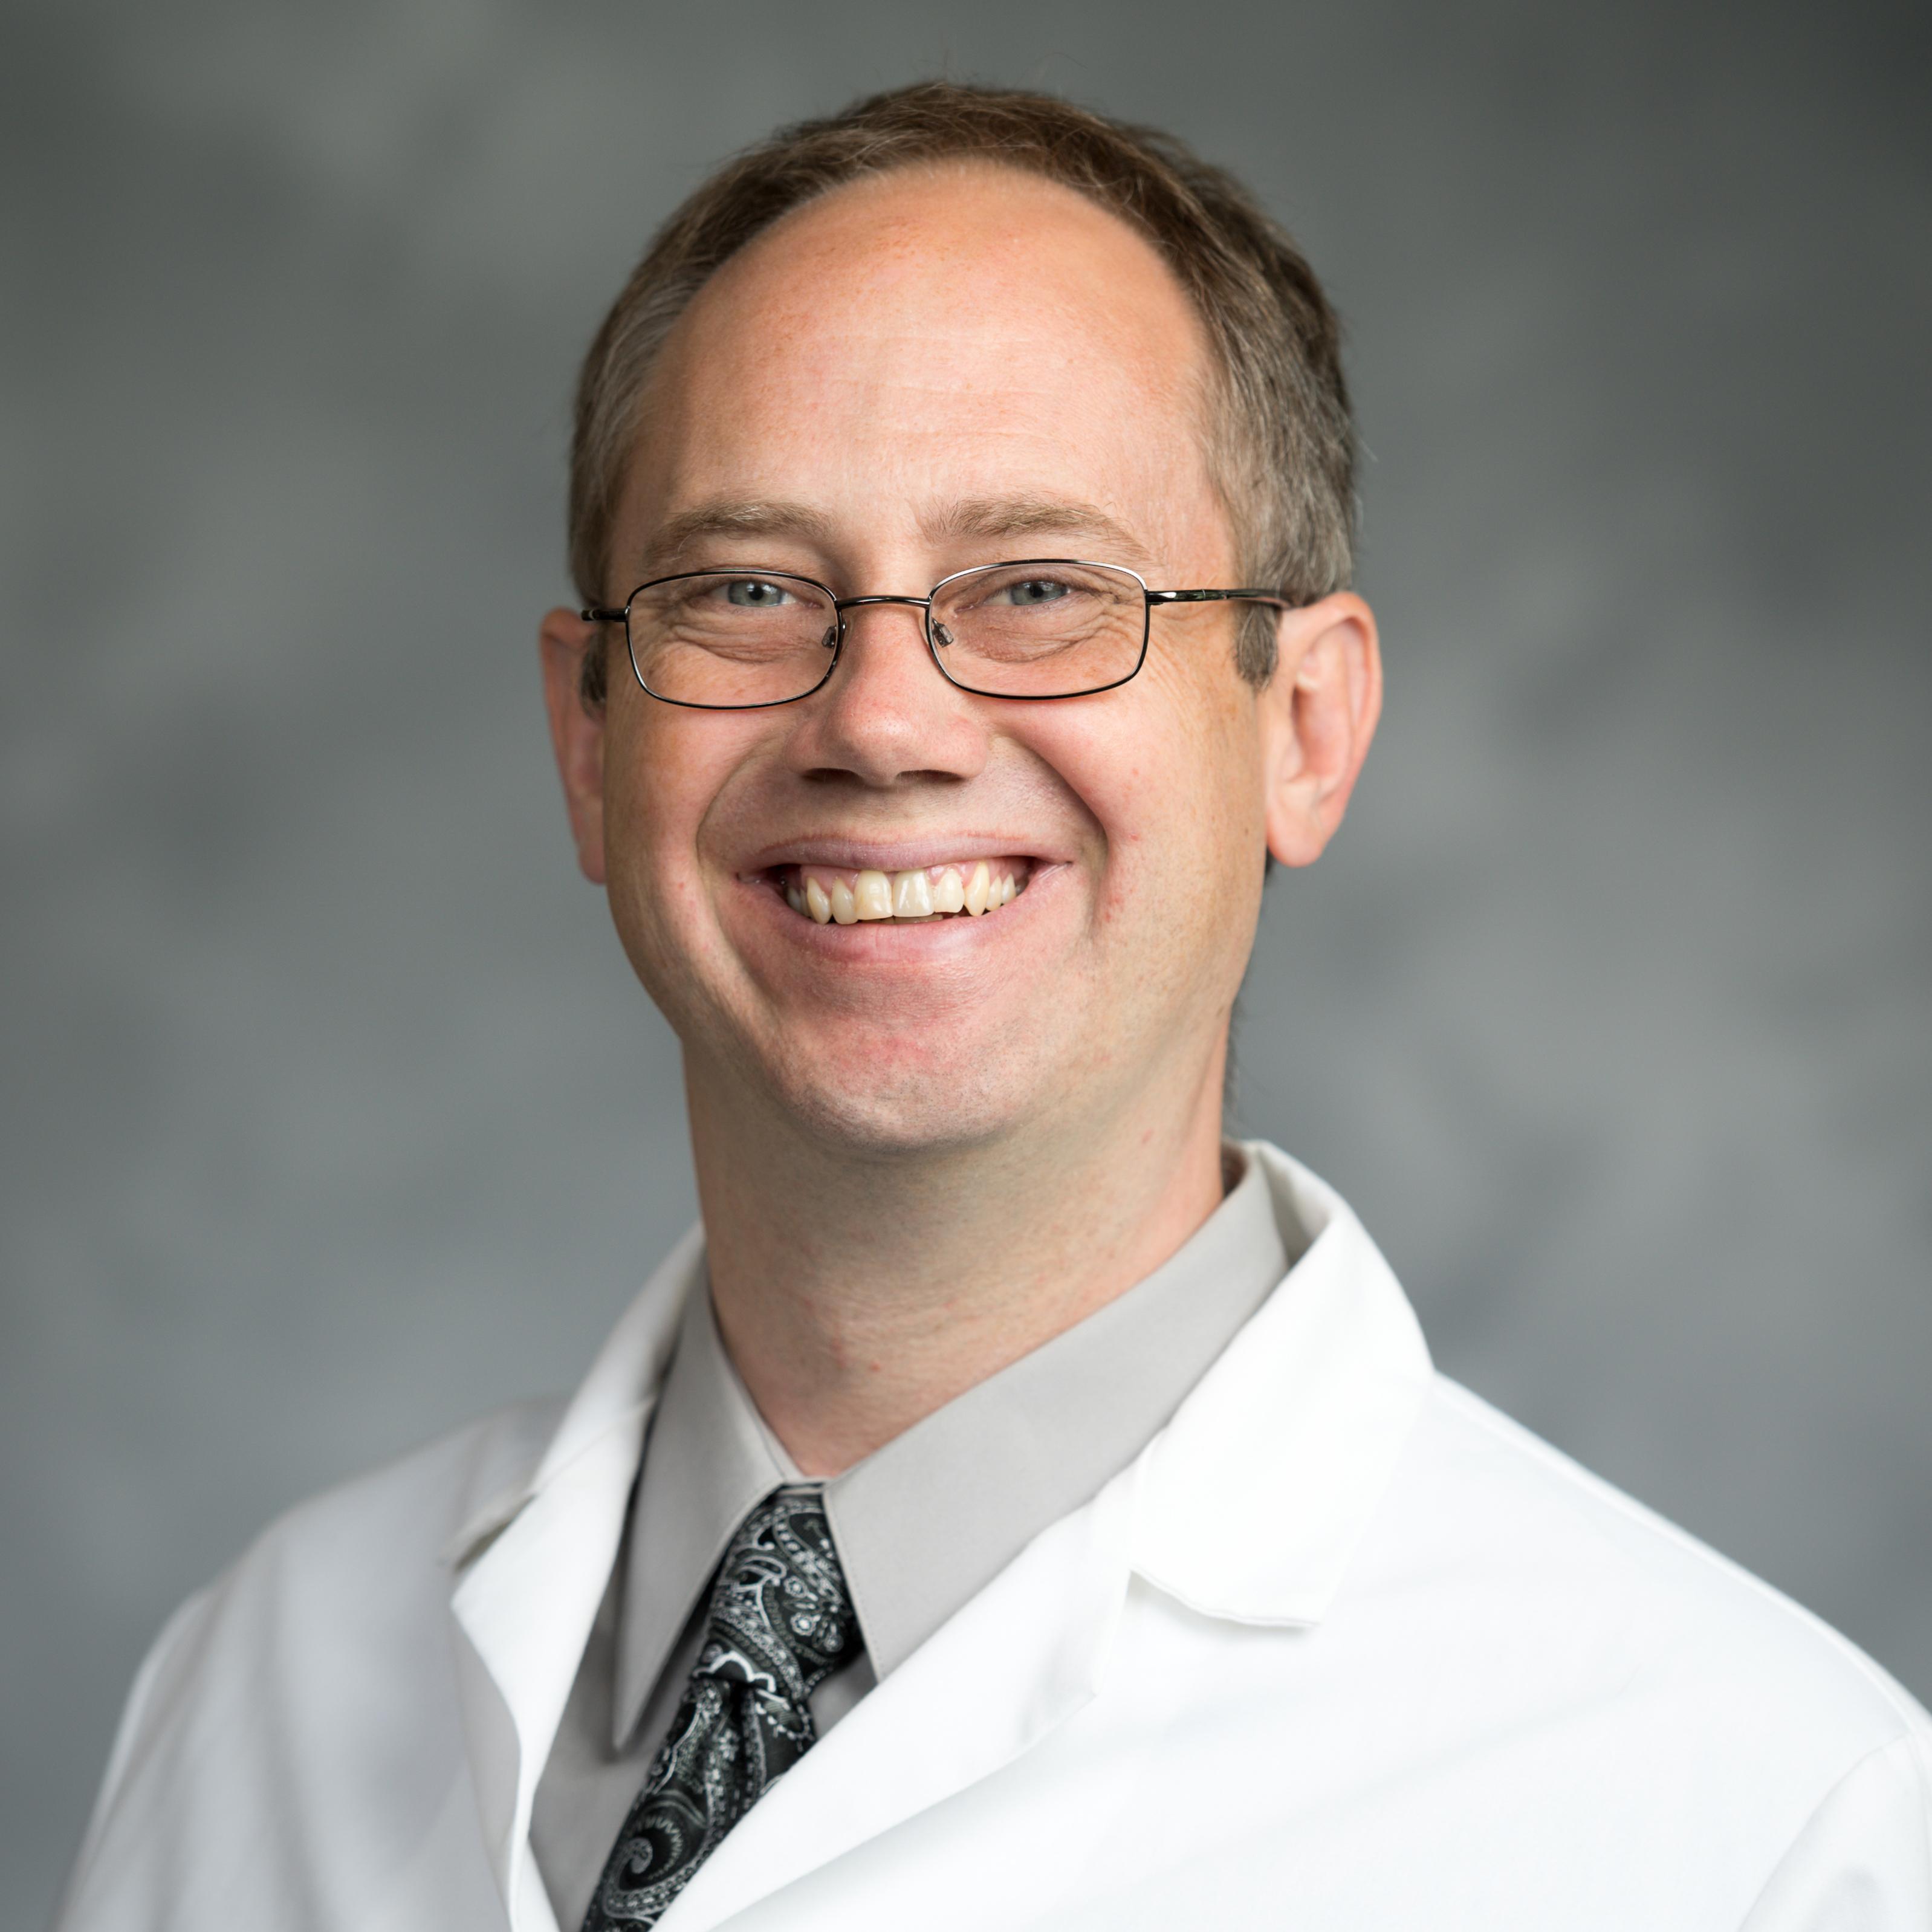 photo of Dr. Benjamin Murdock